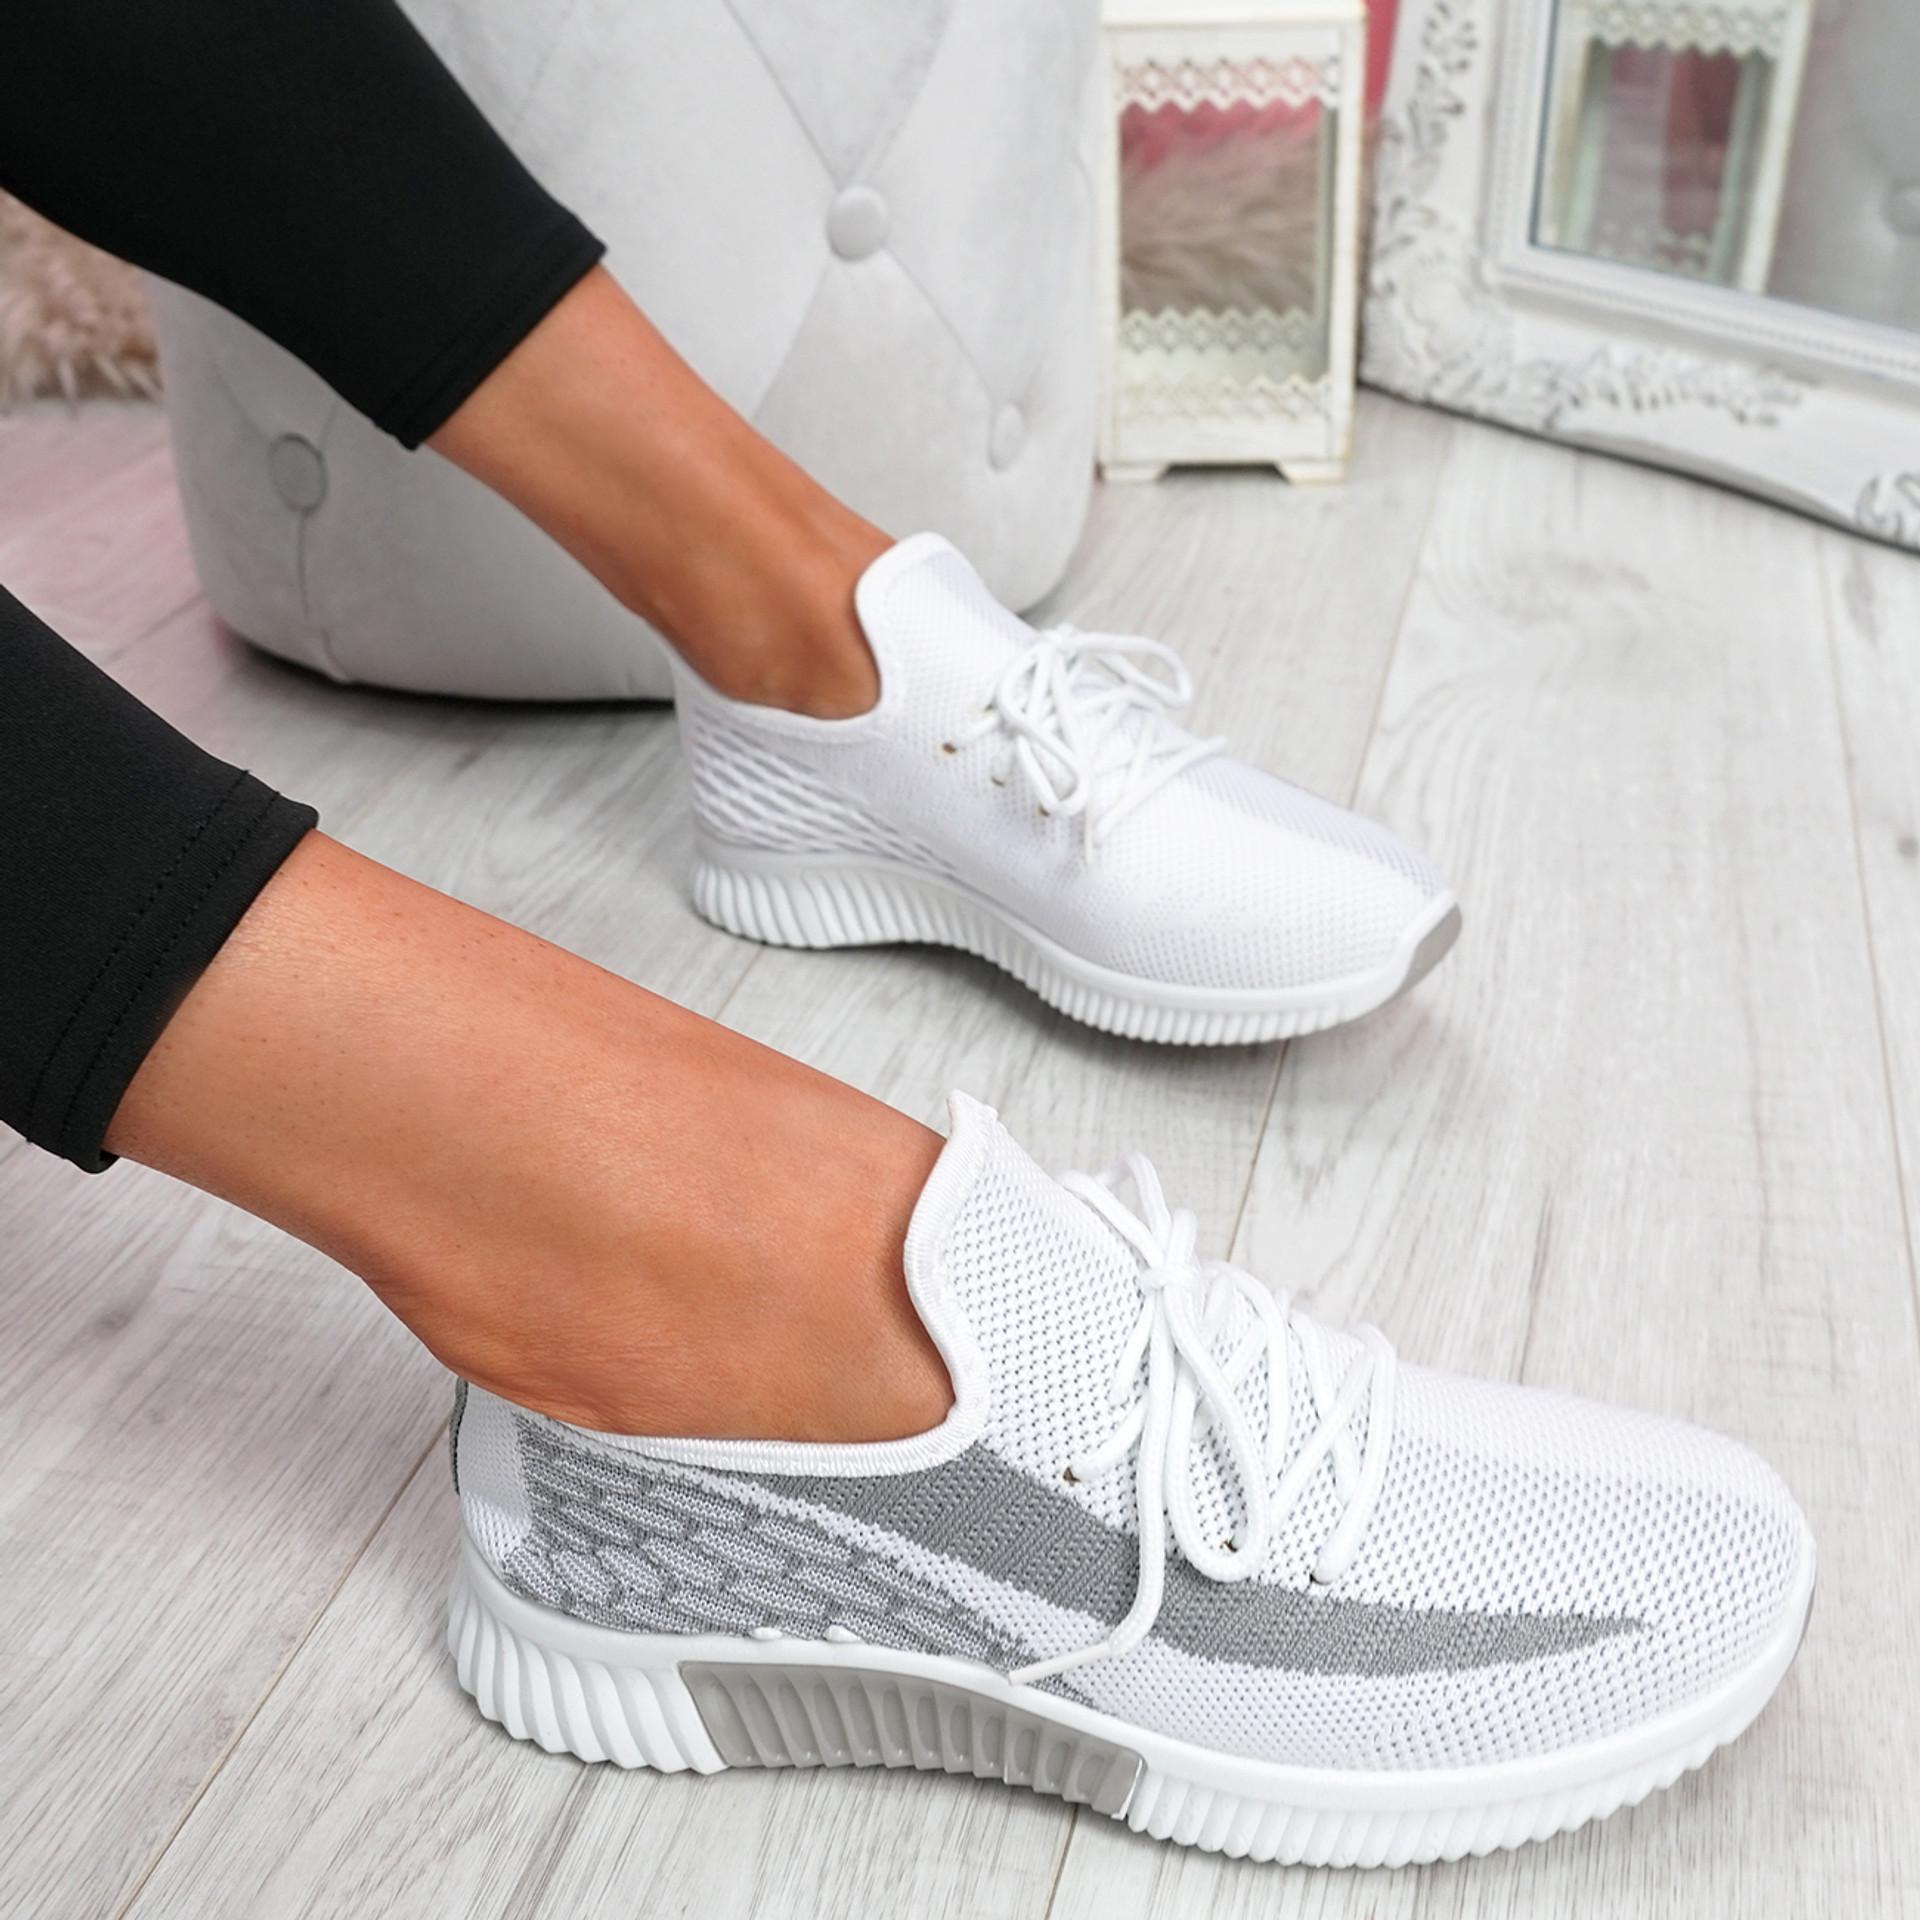 Nova Grey Lace Up Knit Trainers